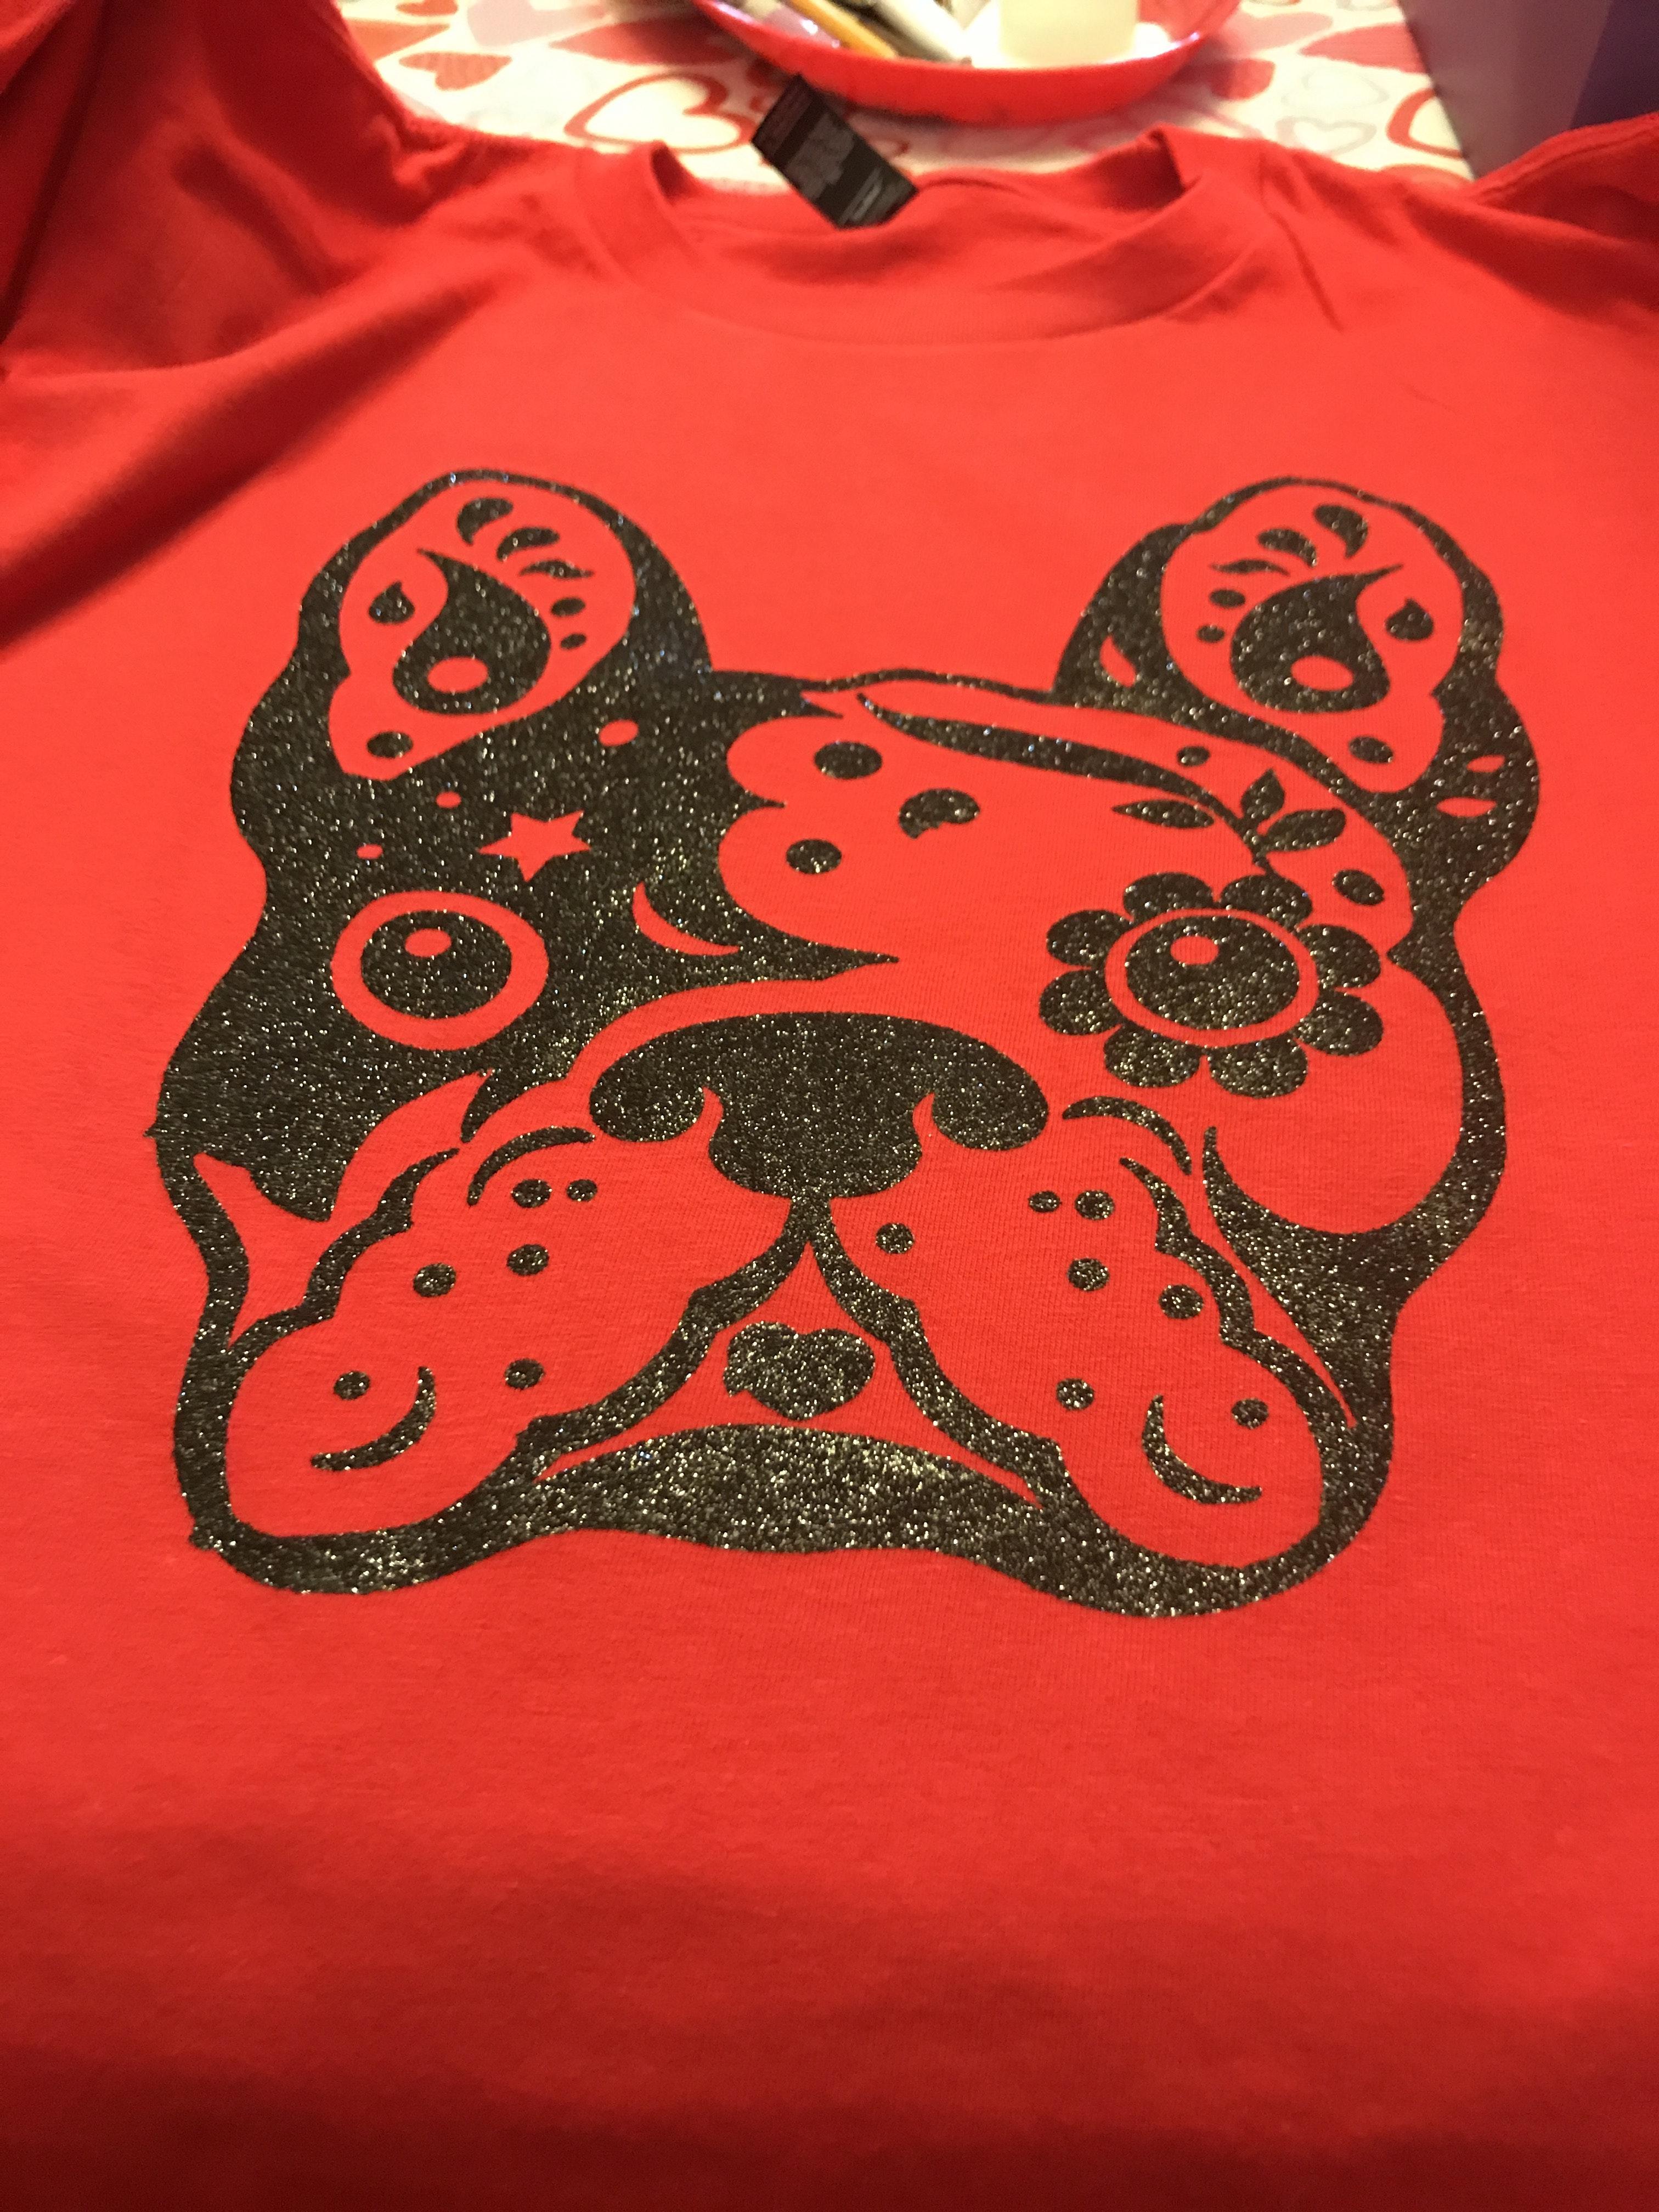 Rabbit Skins 3321 customer review by Karen Campanelli Really nice toddler tee